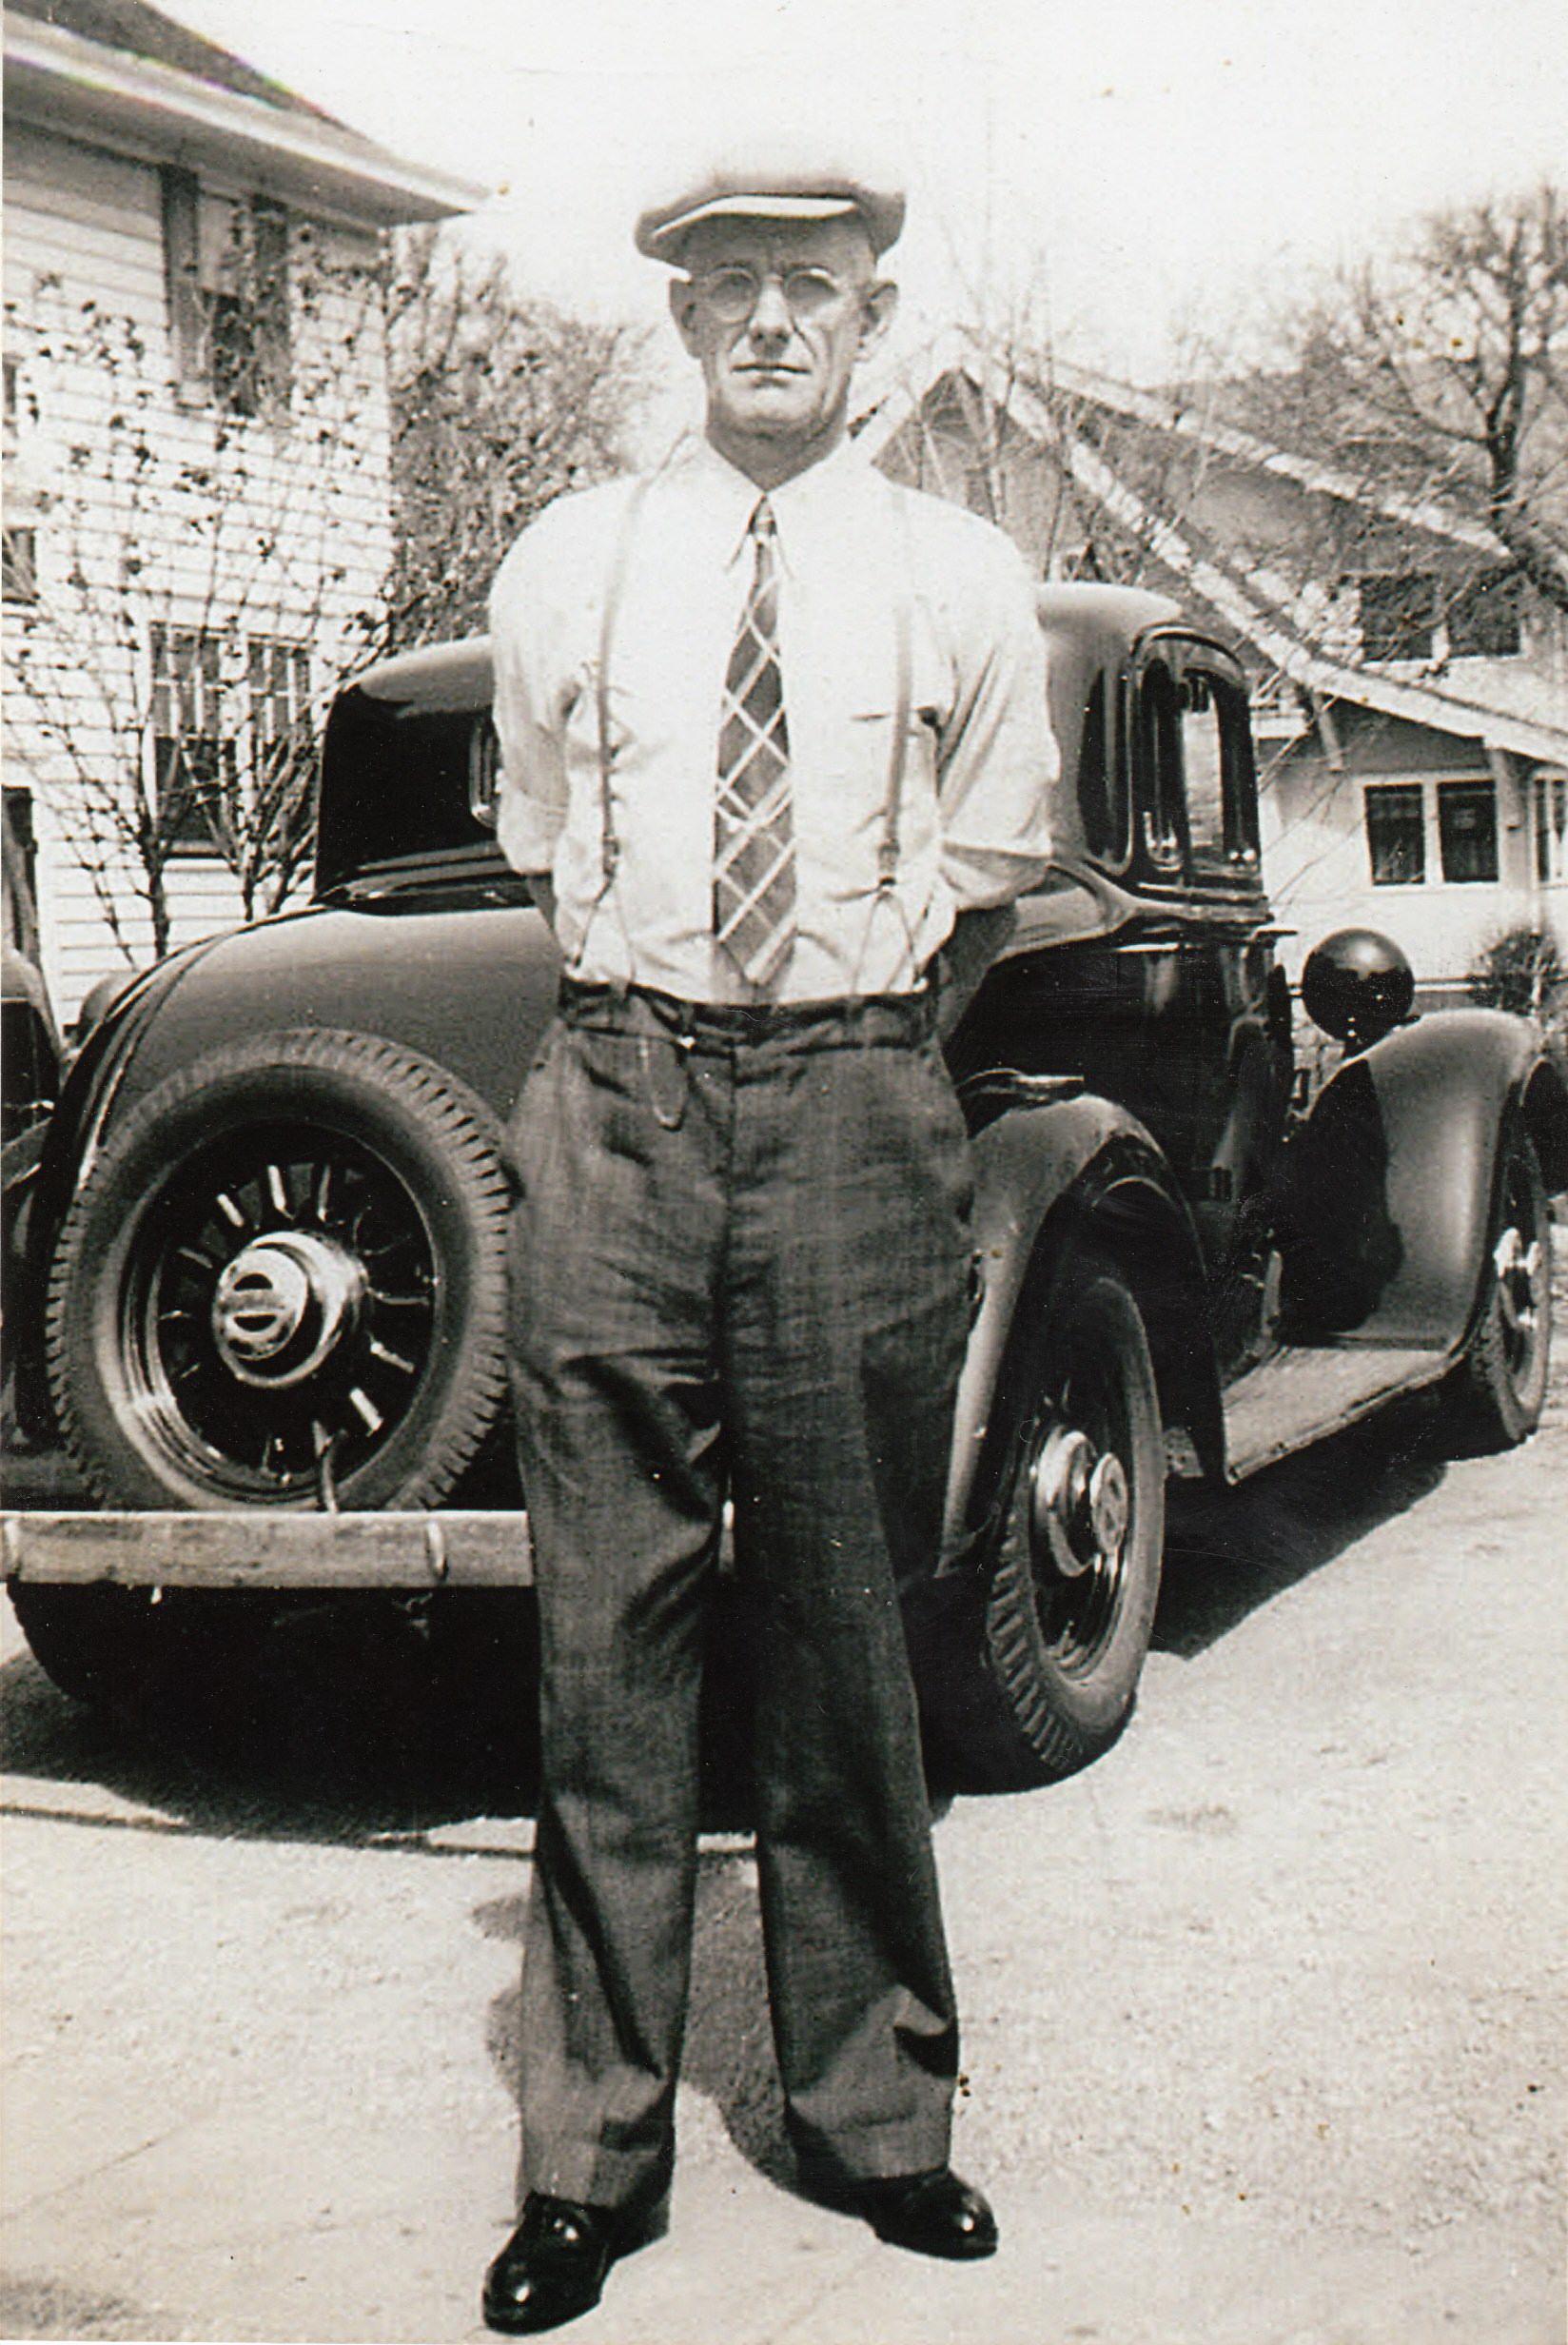 Bernard Joseph Jakobe